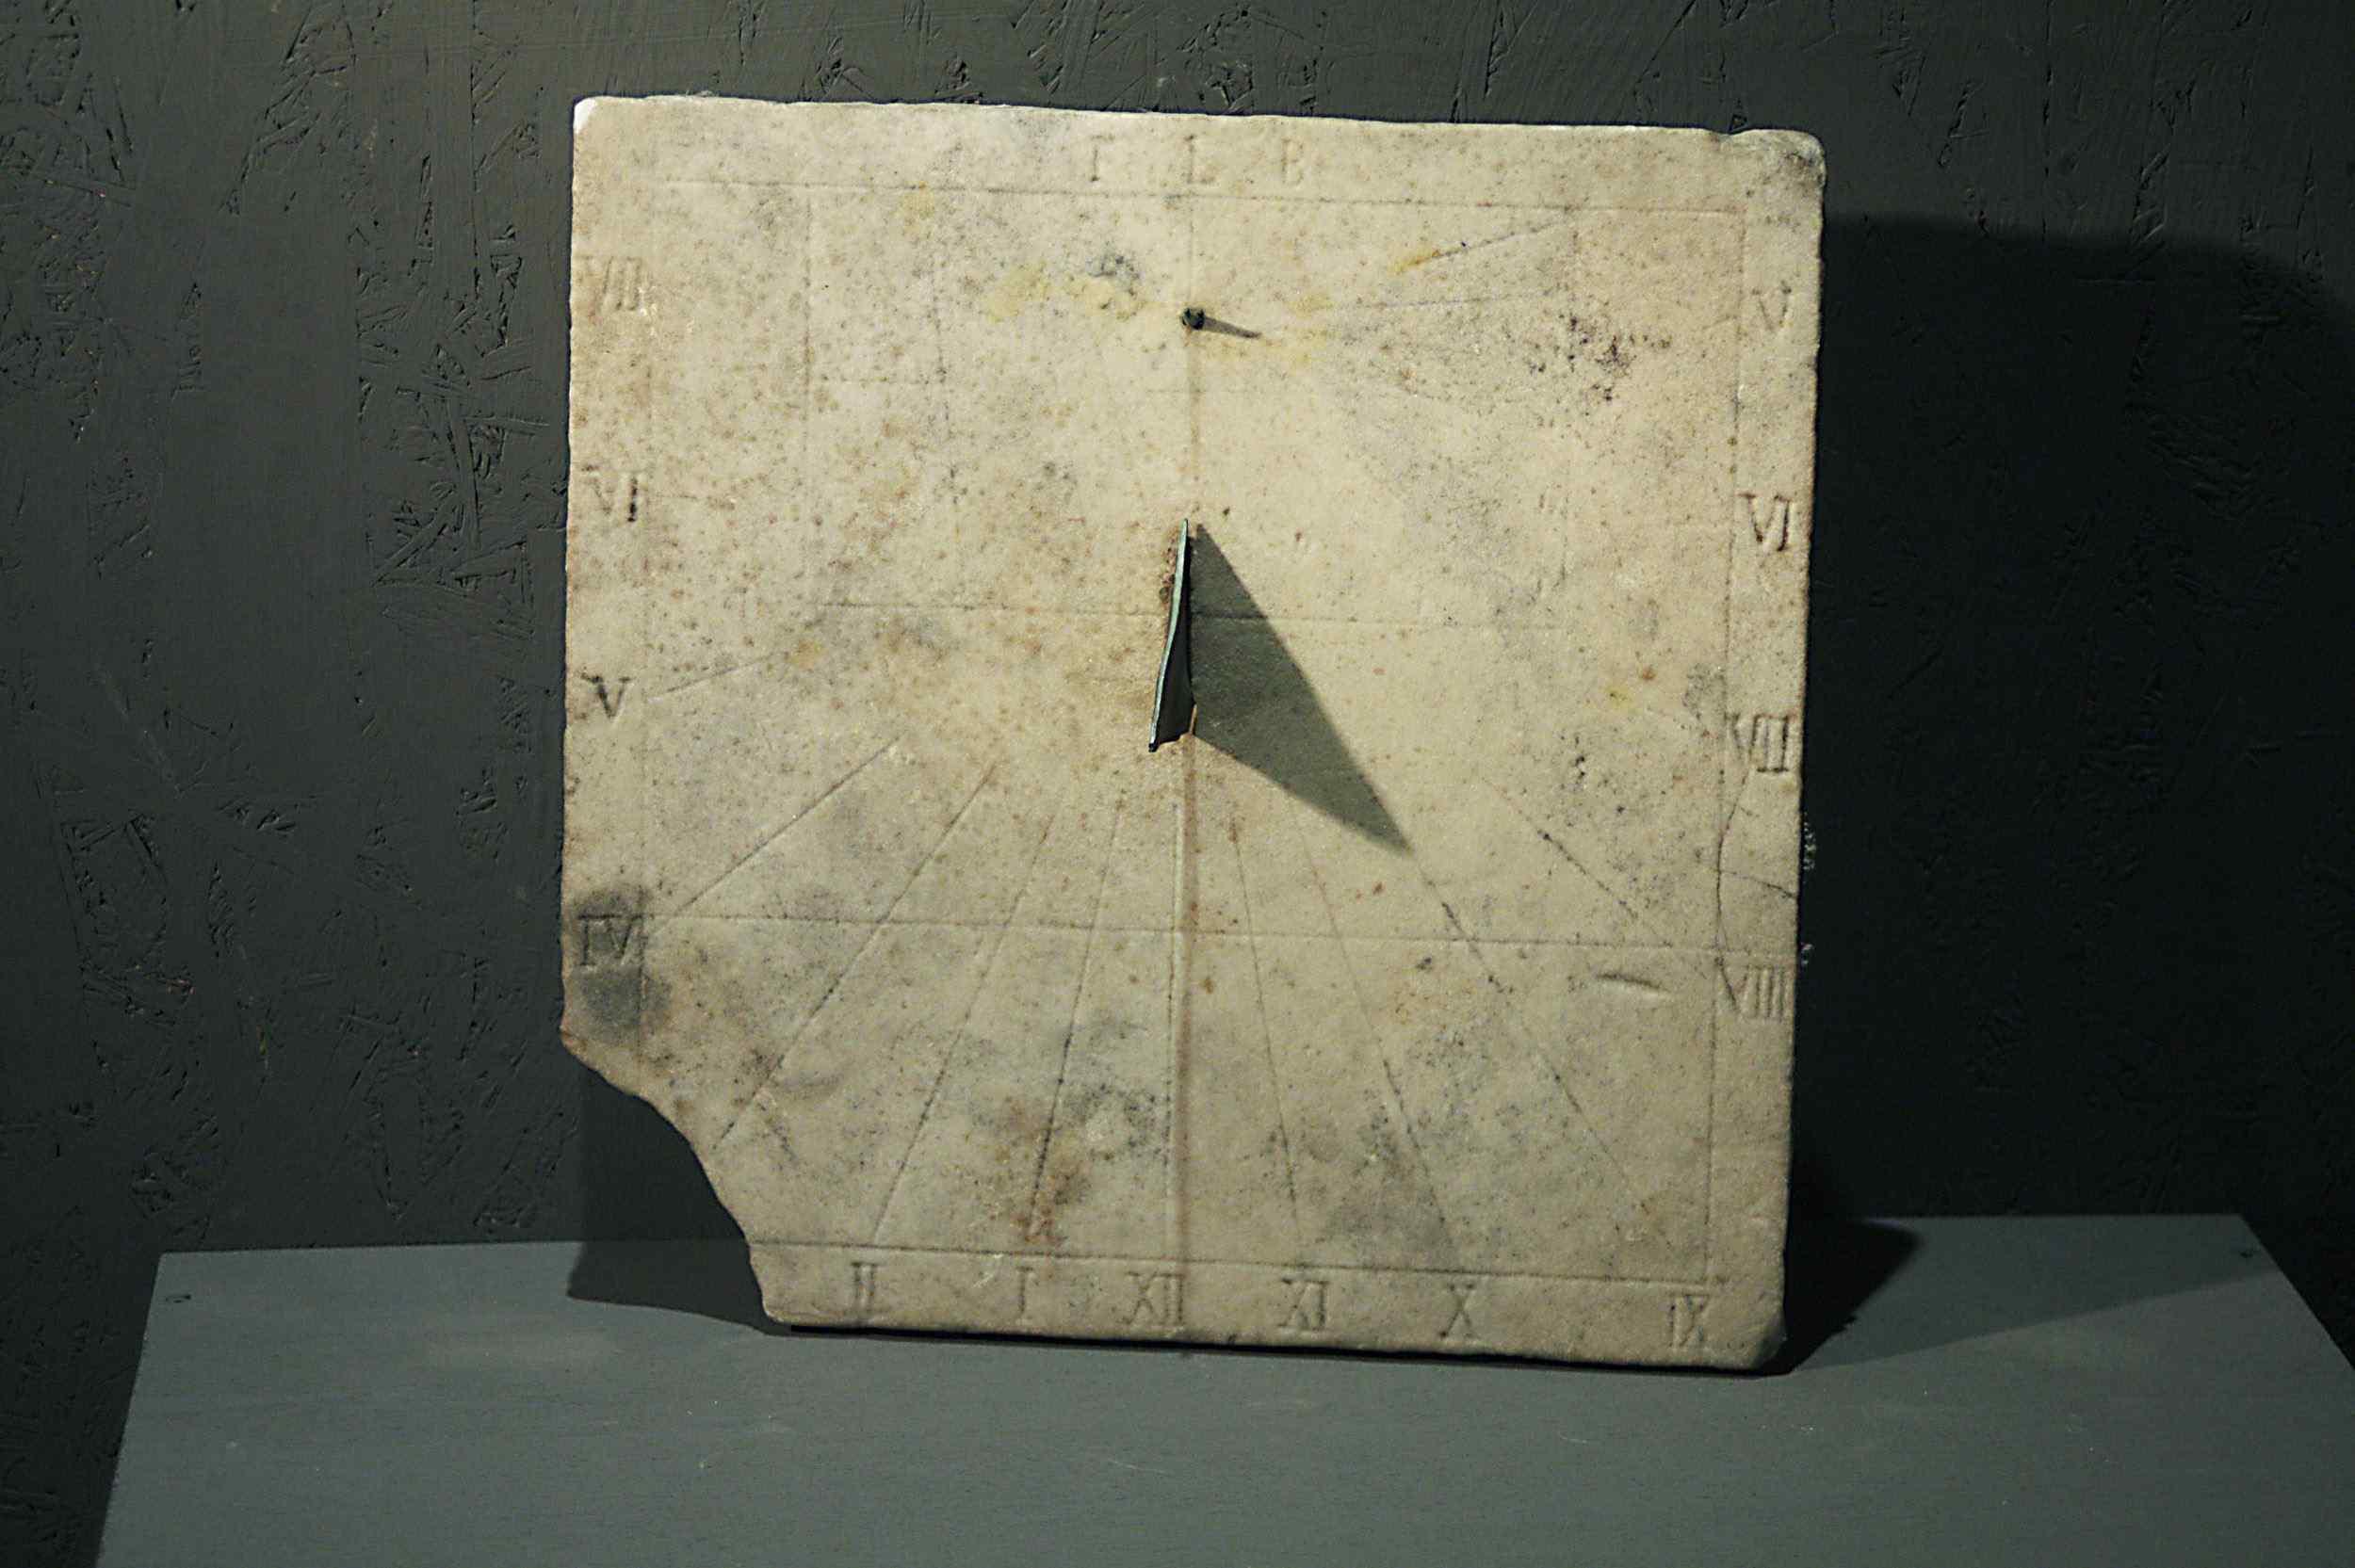 Meridiana in marmo, Italia Centrale, 1600